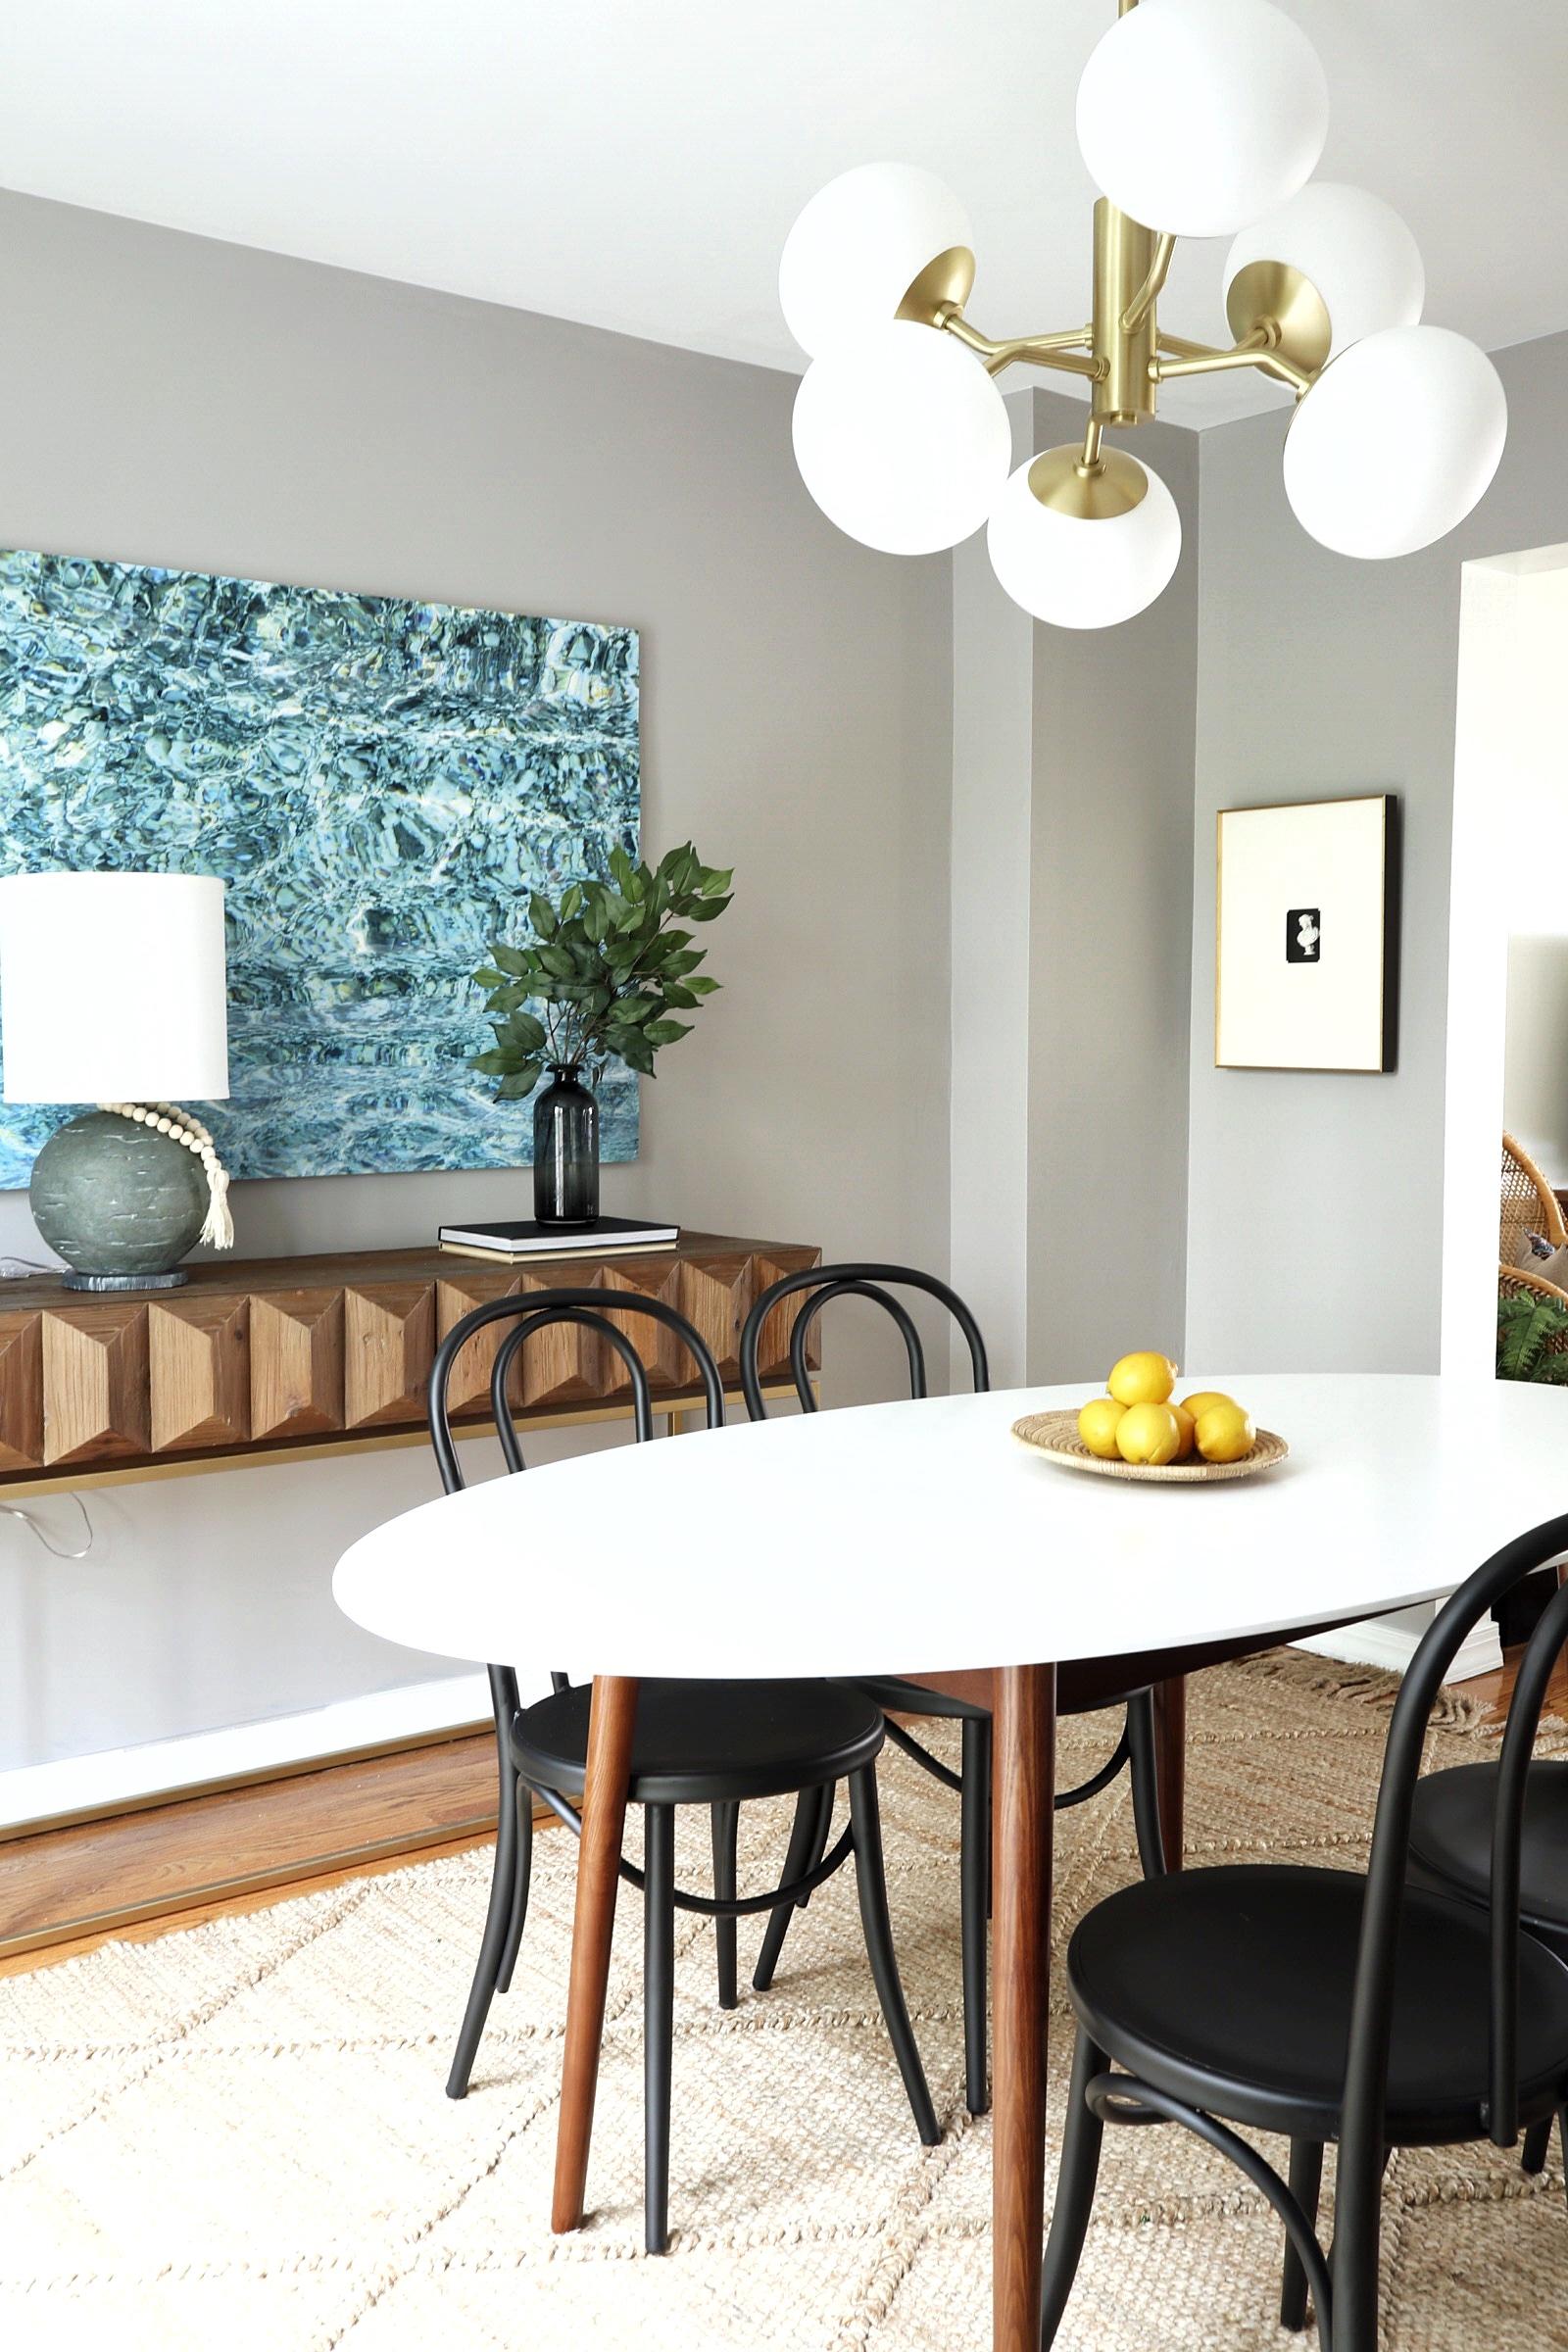 Eclectic-Boho-Dining-Room.jpg